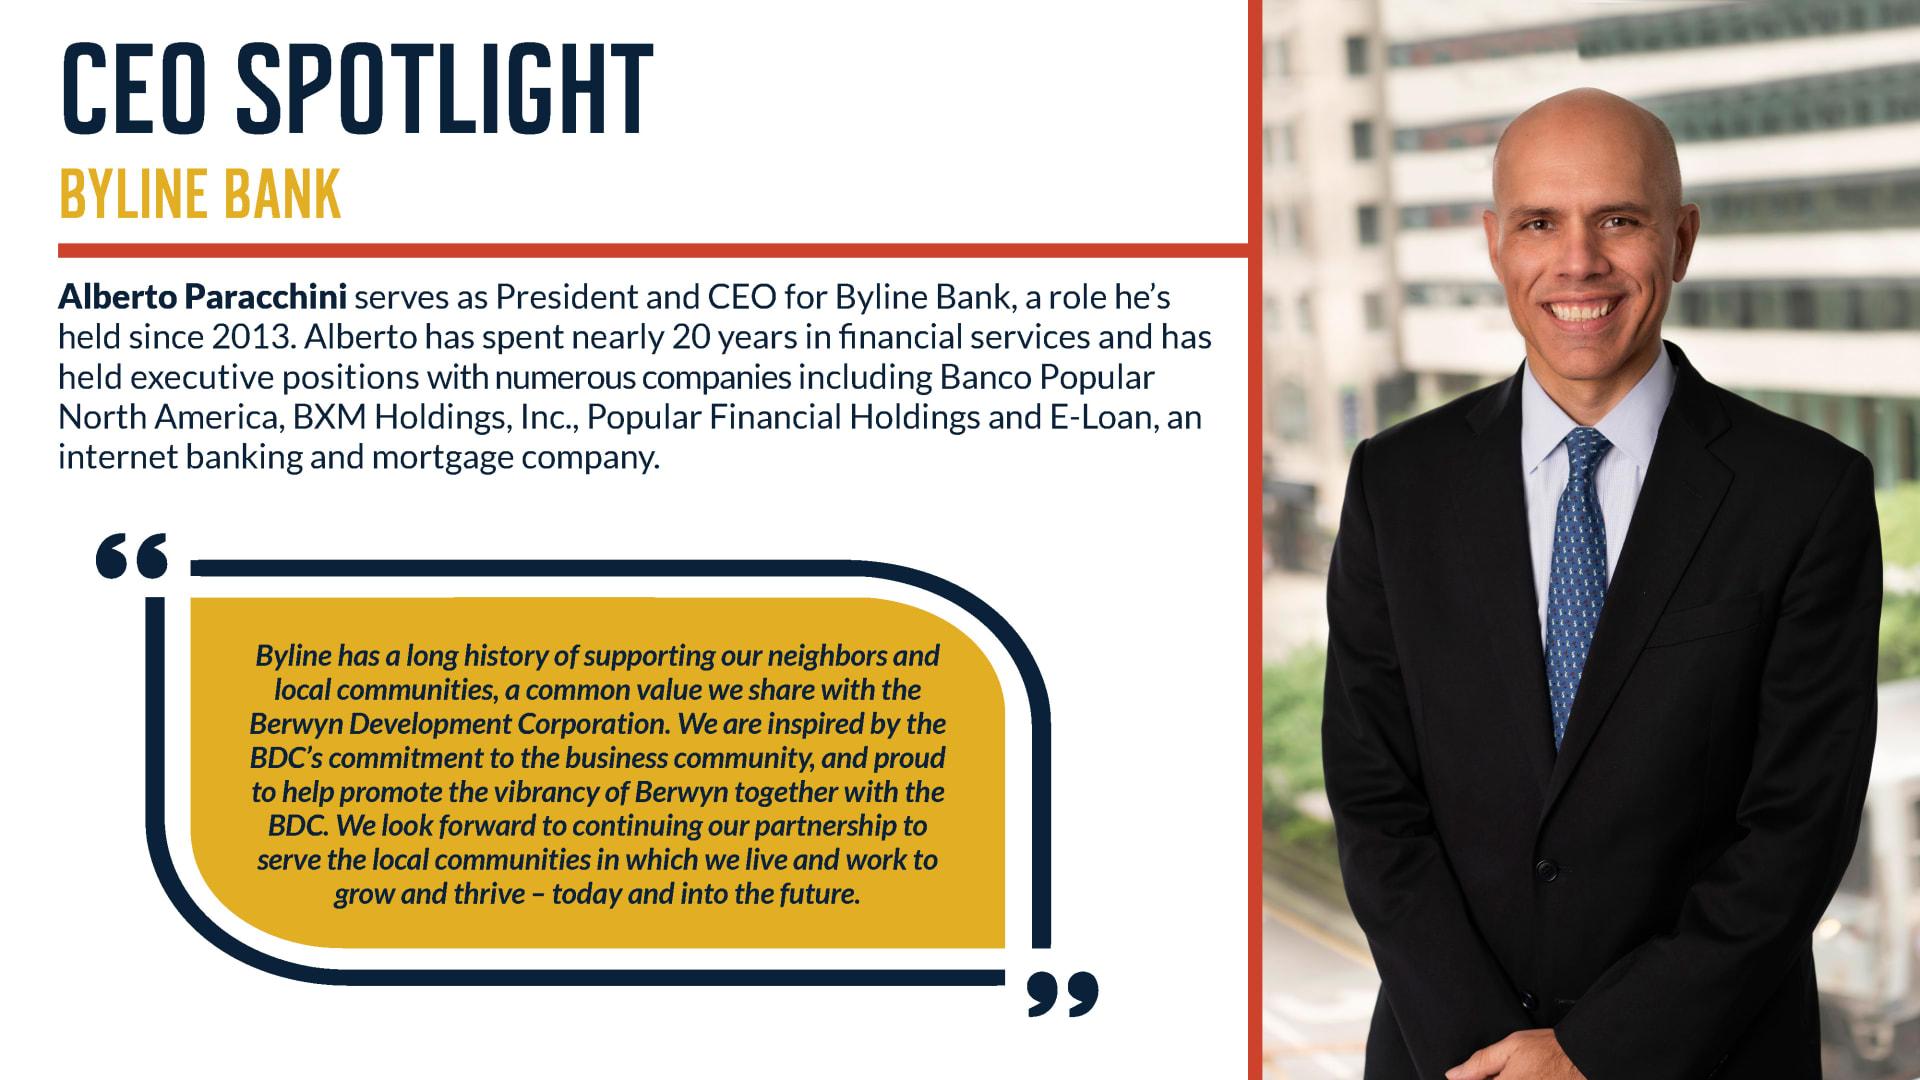 CEO-Spotlights-2020_Page_1-w1920.jpg